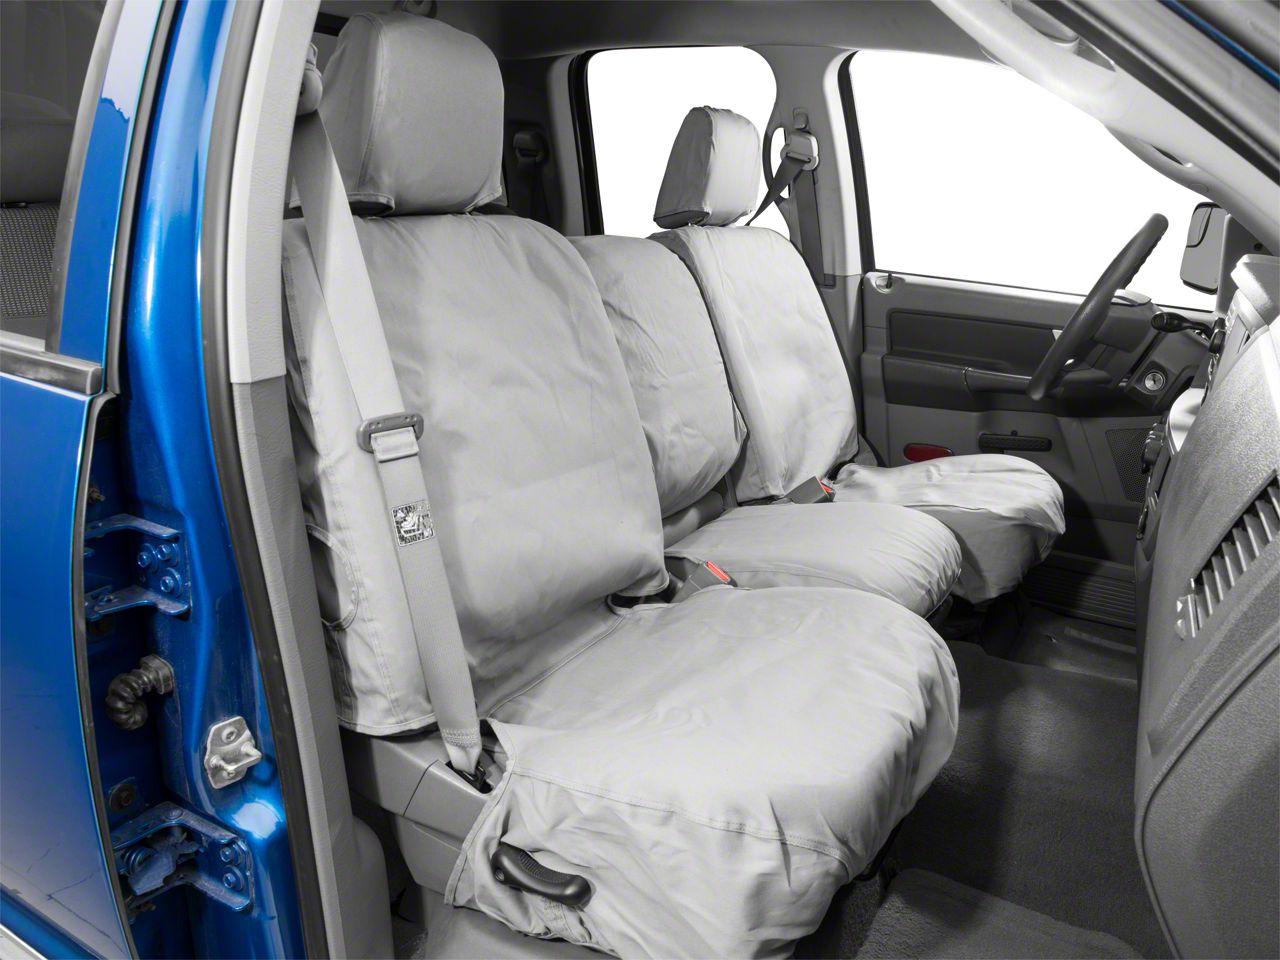 Covercraft SeatSaver Front Row Seat Covers - Gray (02-08 RAM 1500 w/ Bench Seat)